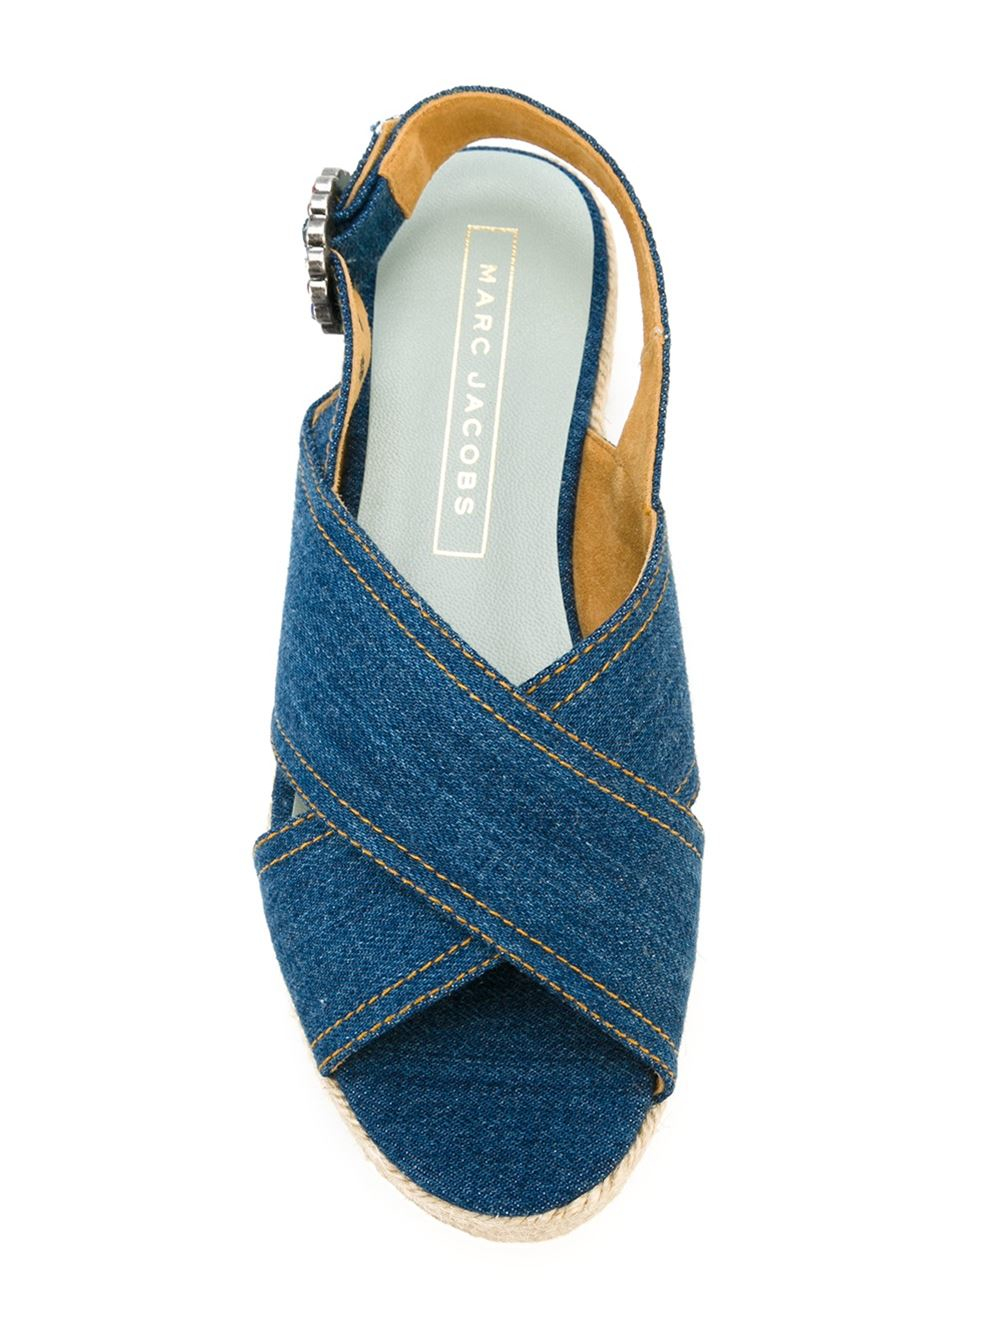 Marc Jacobs Denim Flatform Sandals In Blue Lyst